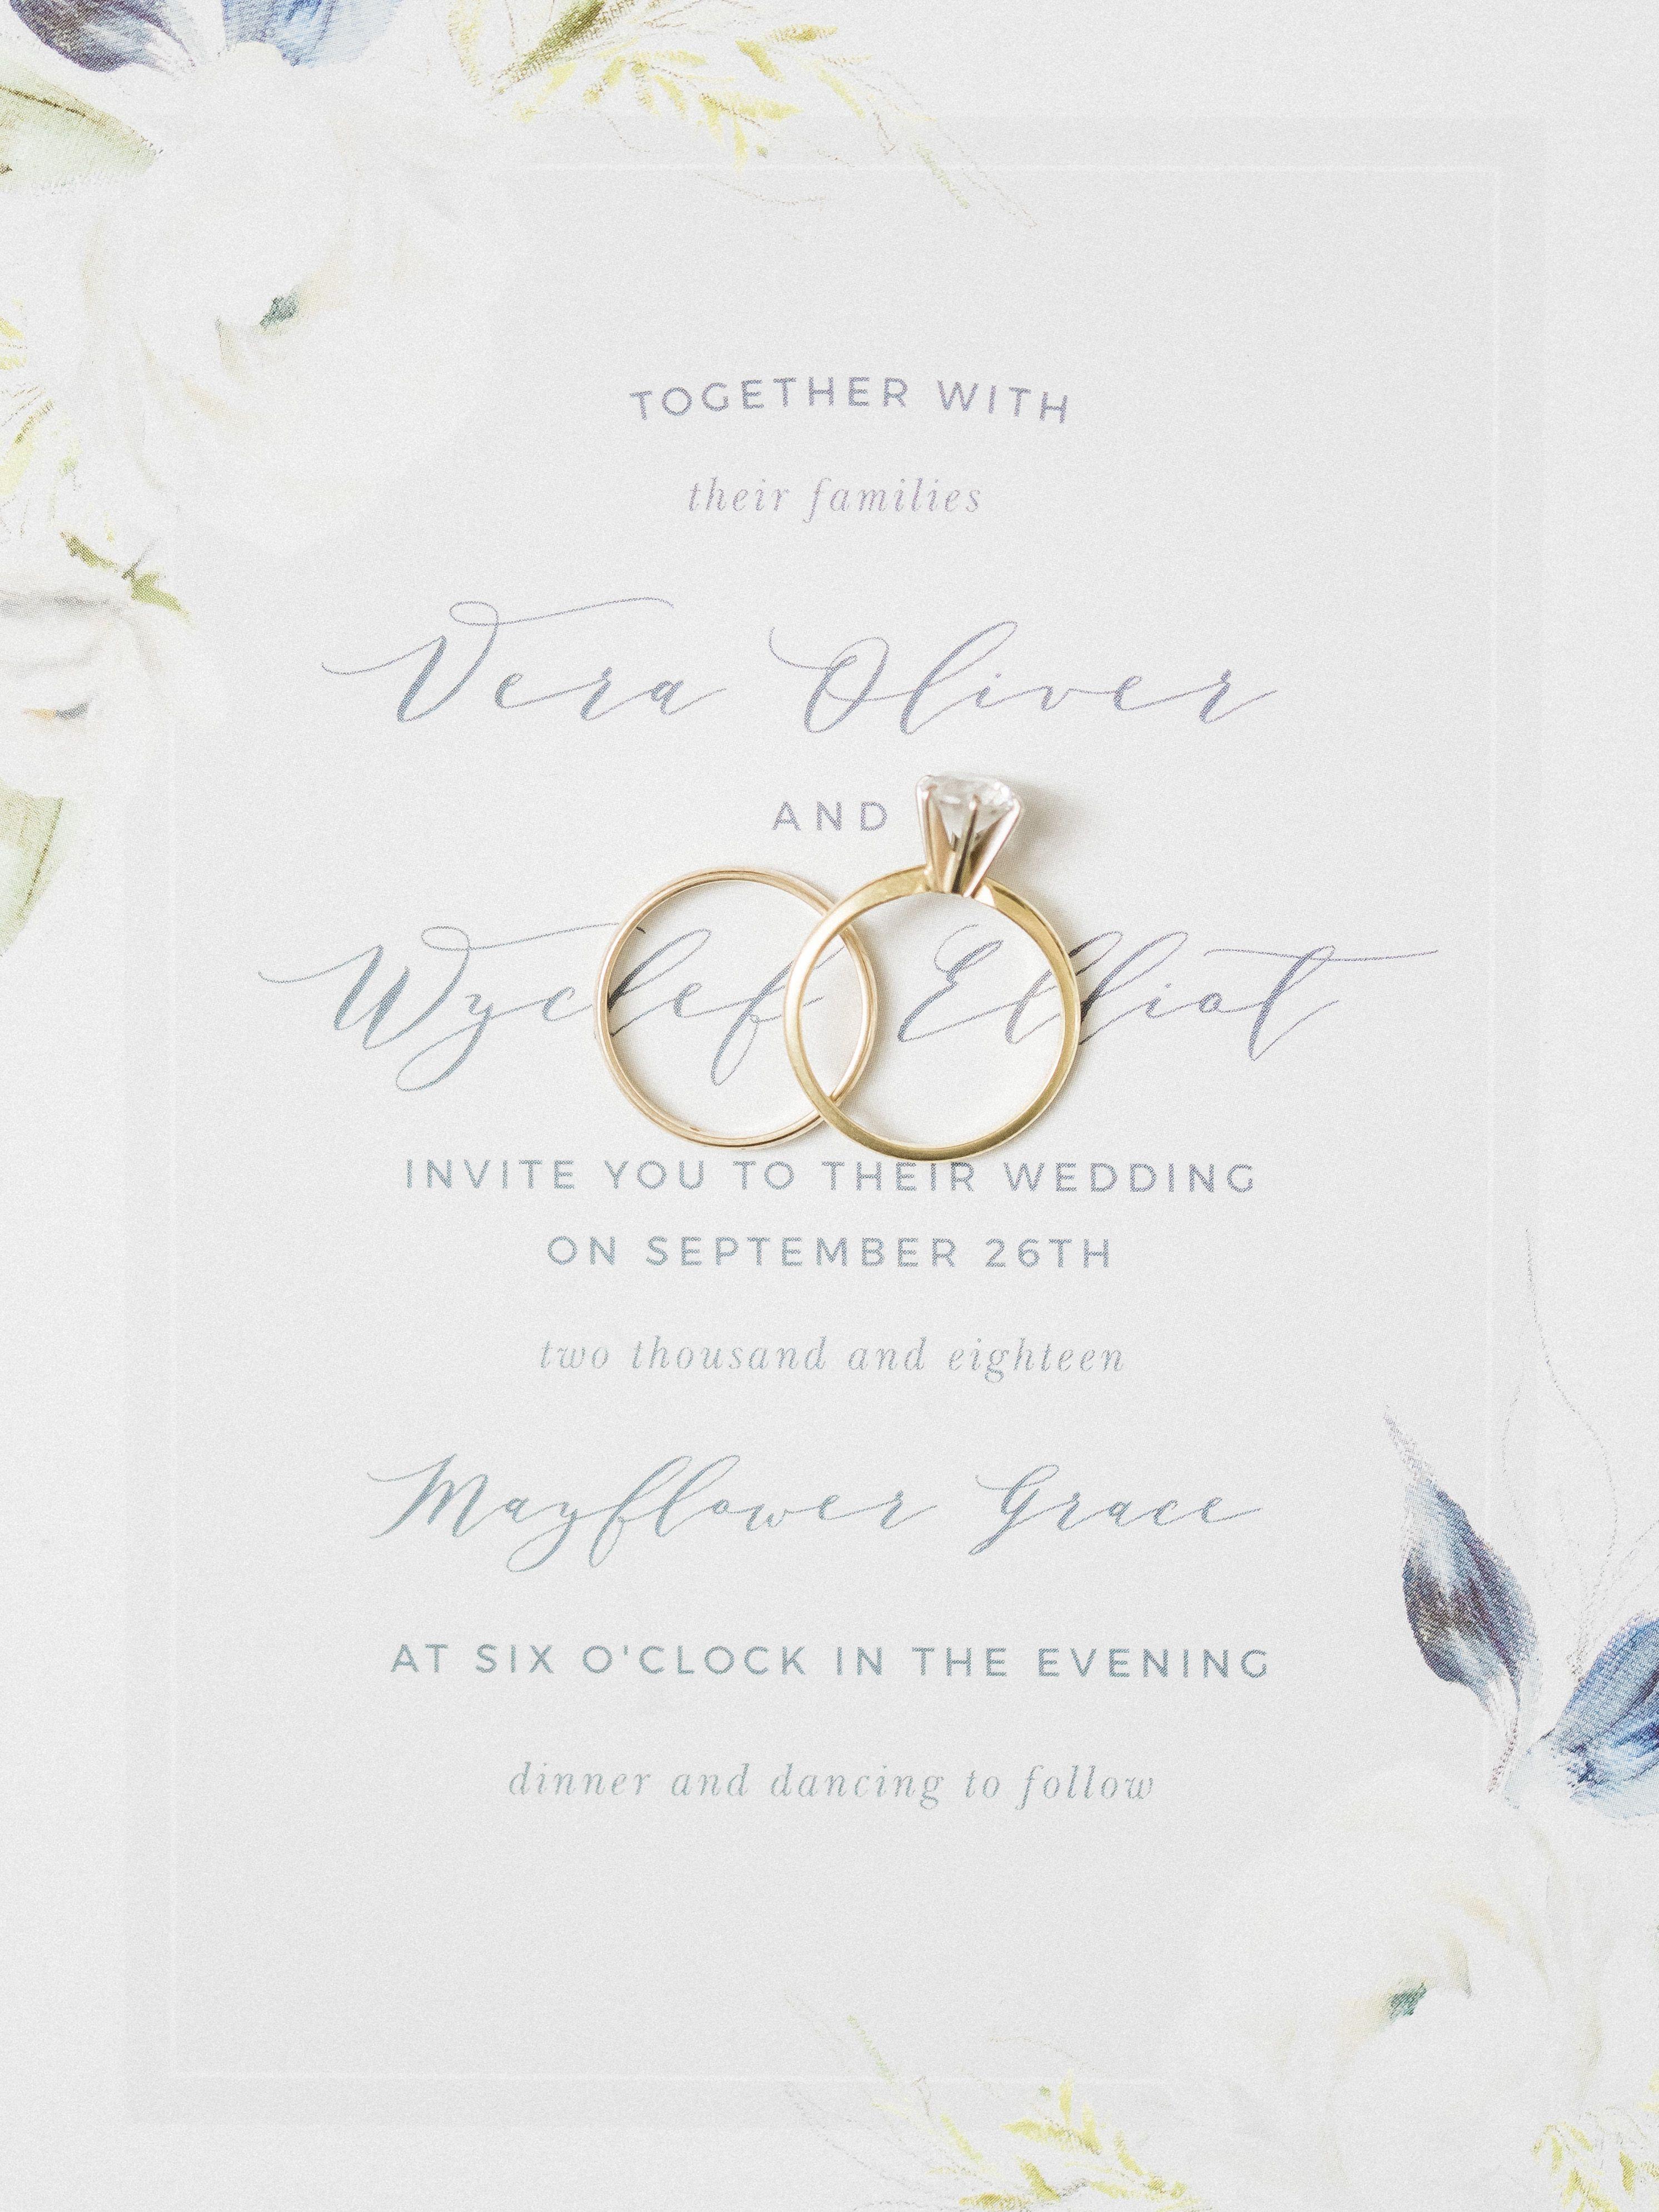 Oil Paint Textured Wedding Invitations Fun Wedding Invitations